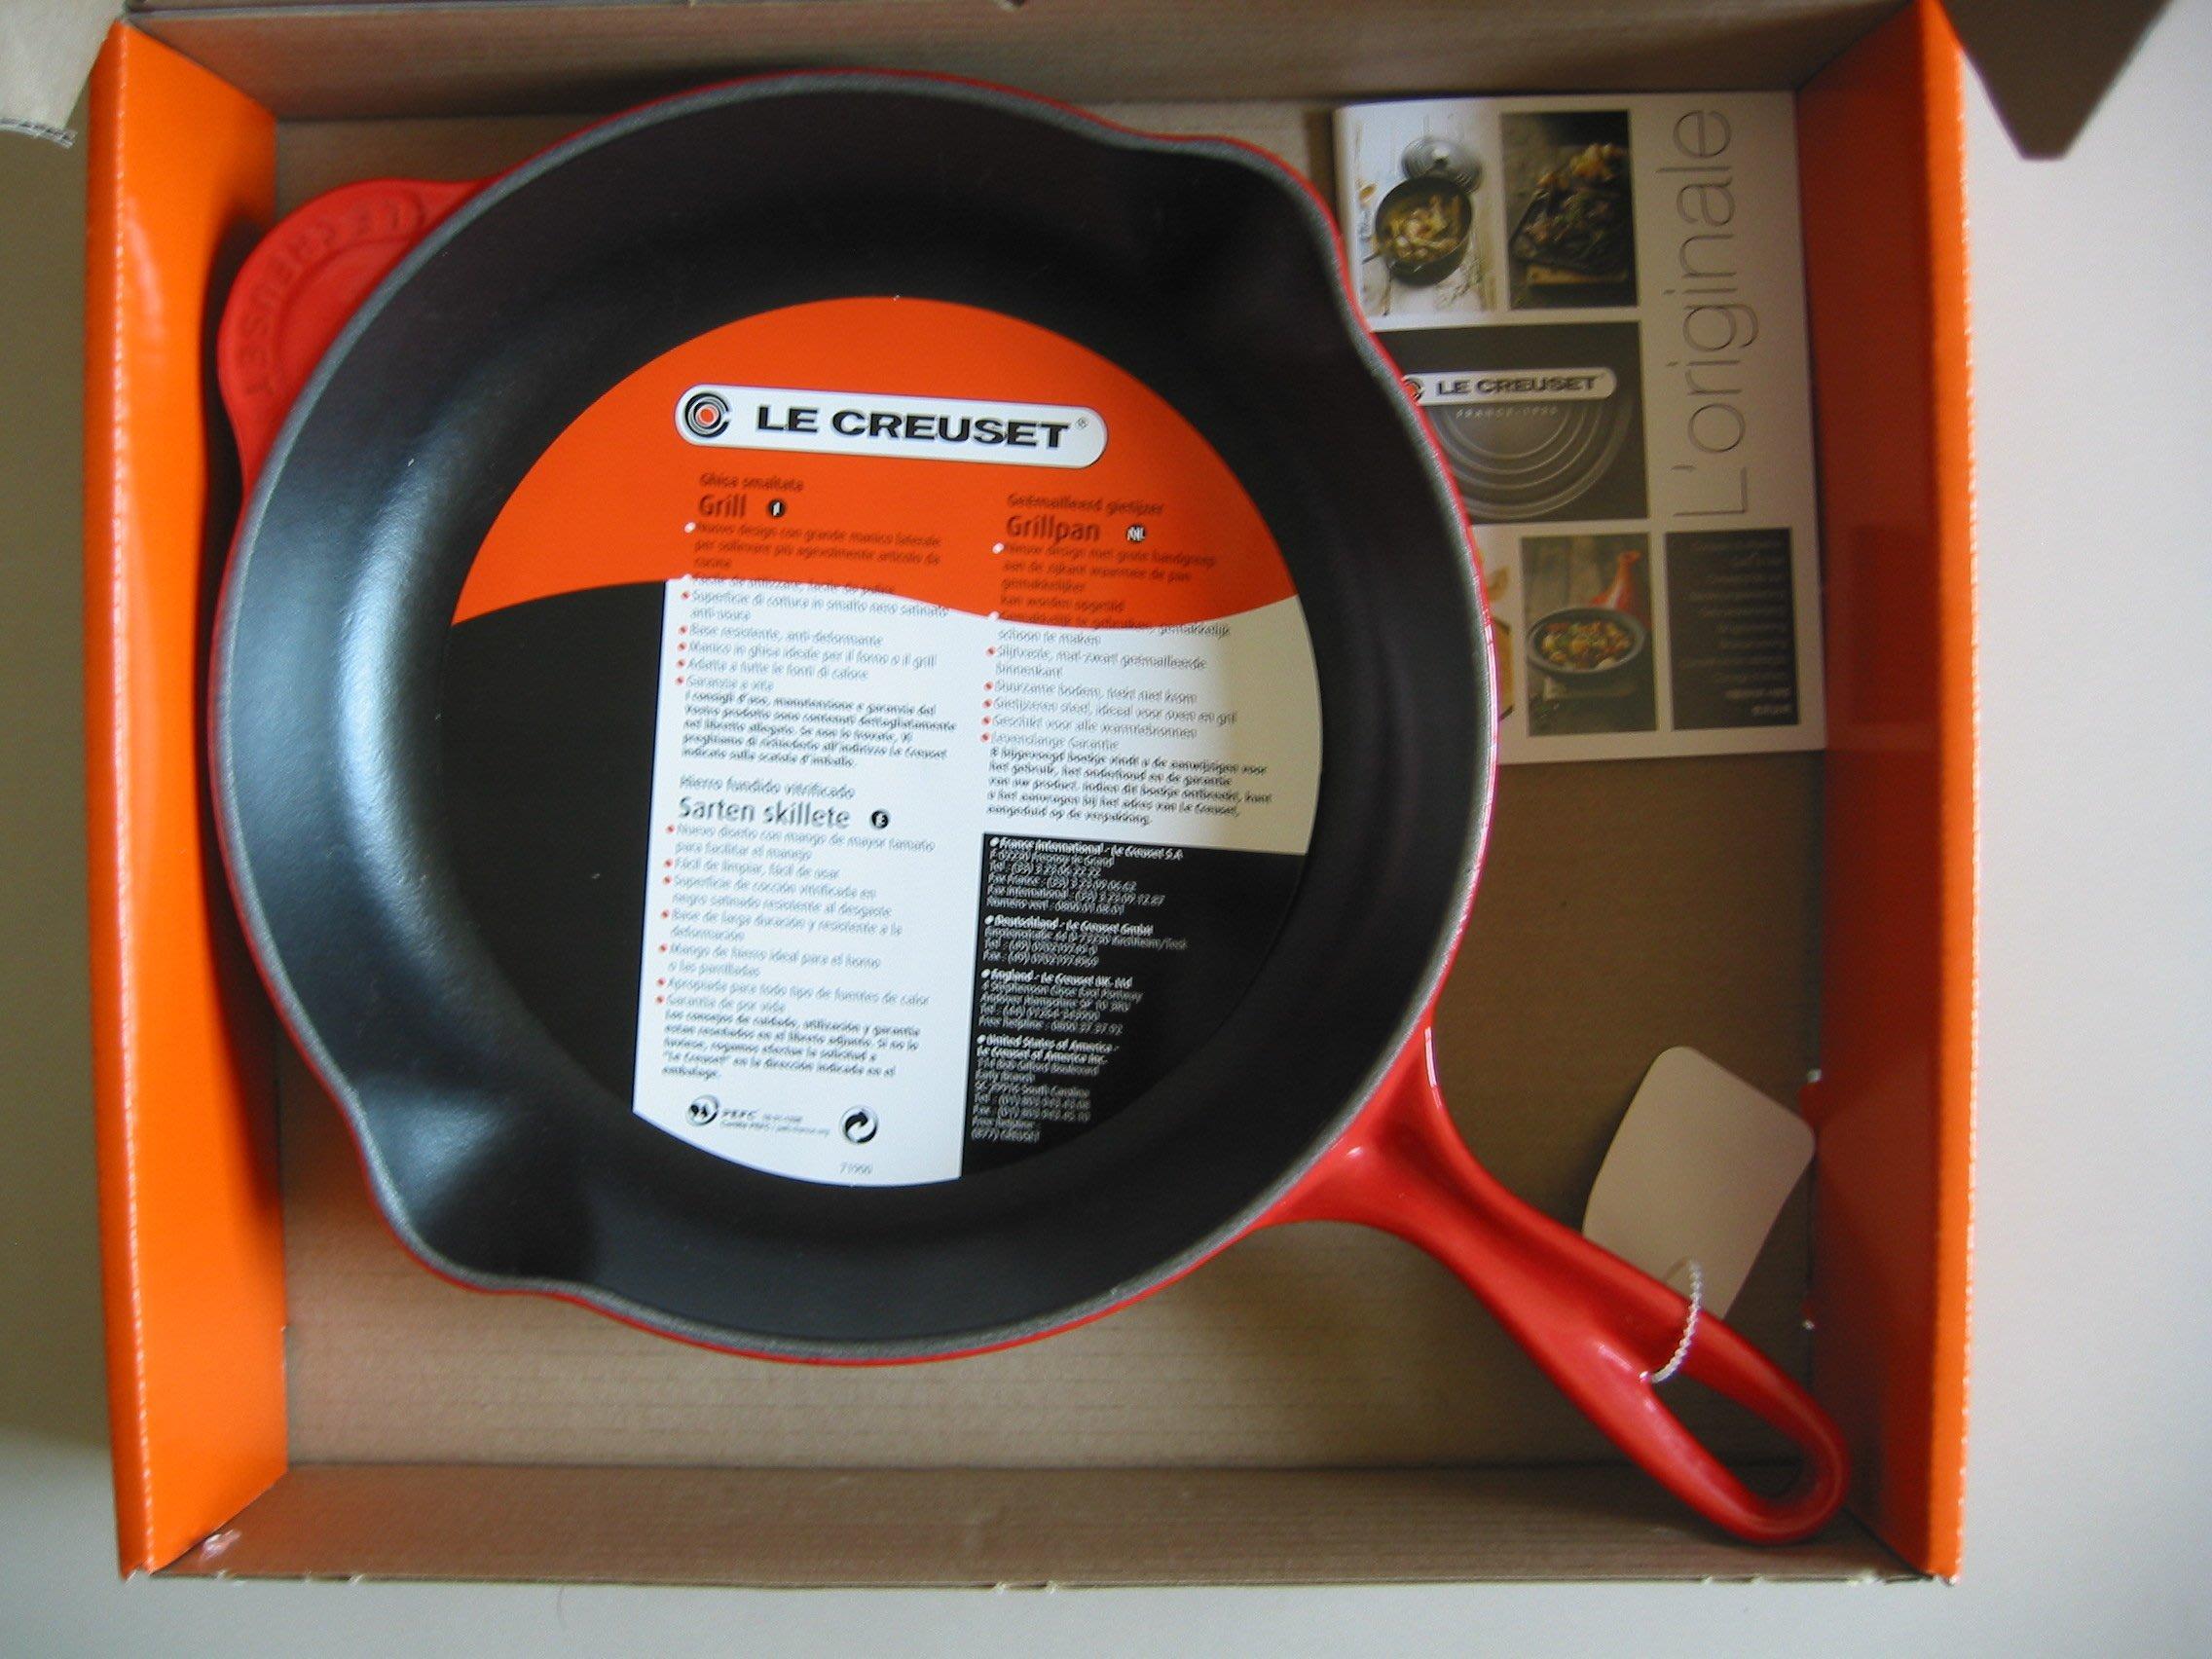 Le Creuset 26cm 單柄鑄鐵平底煎鍋